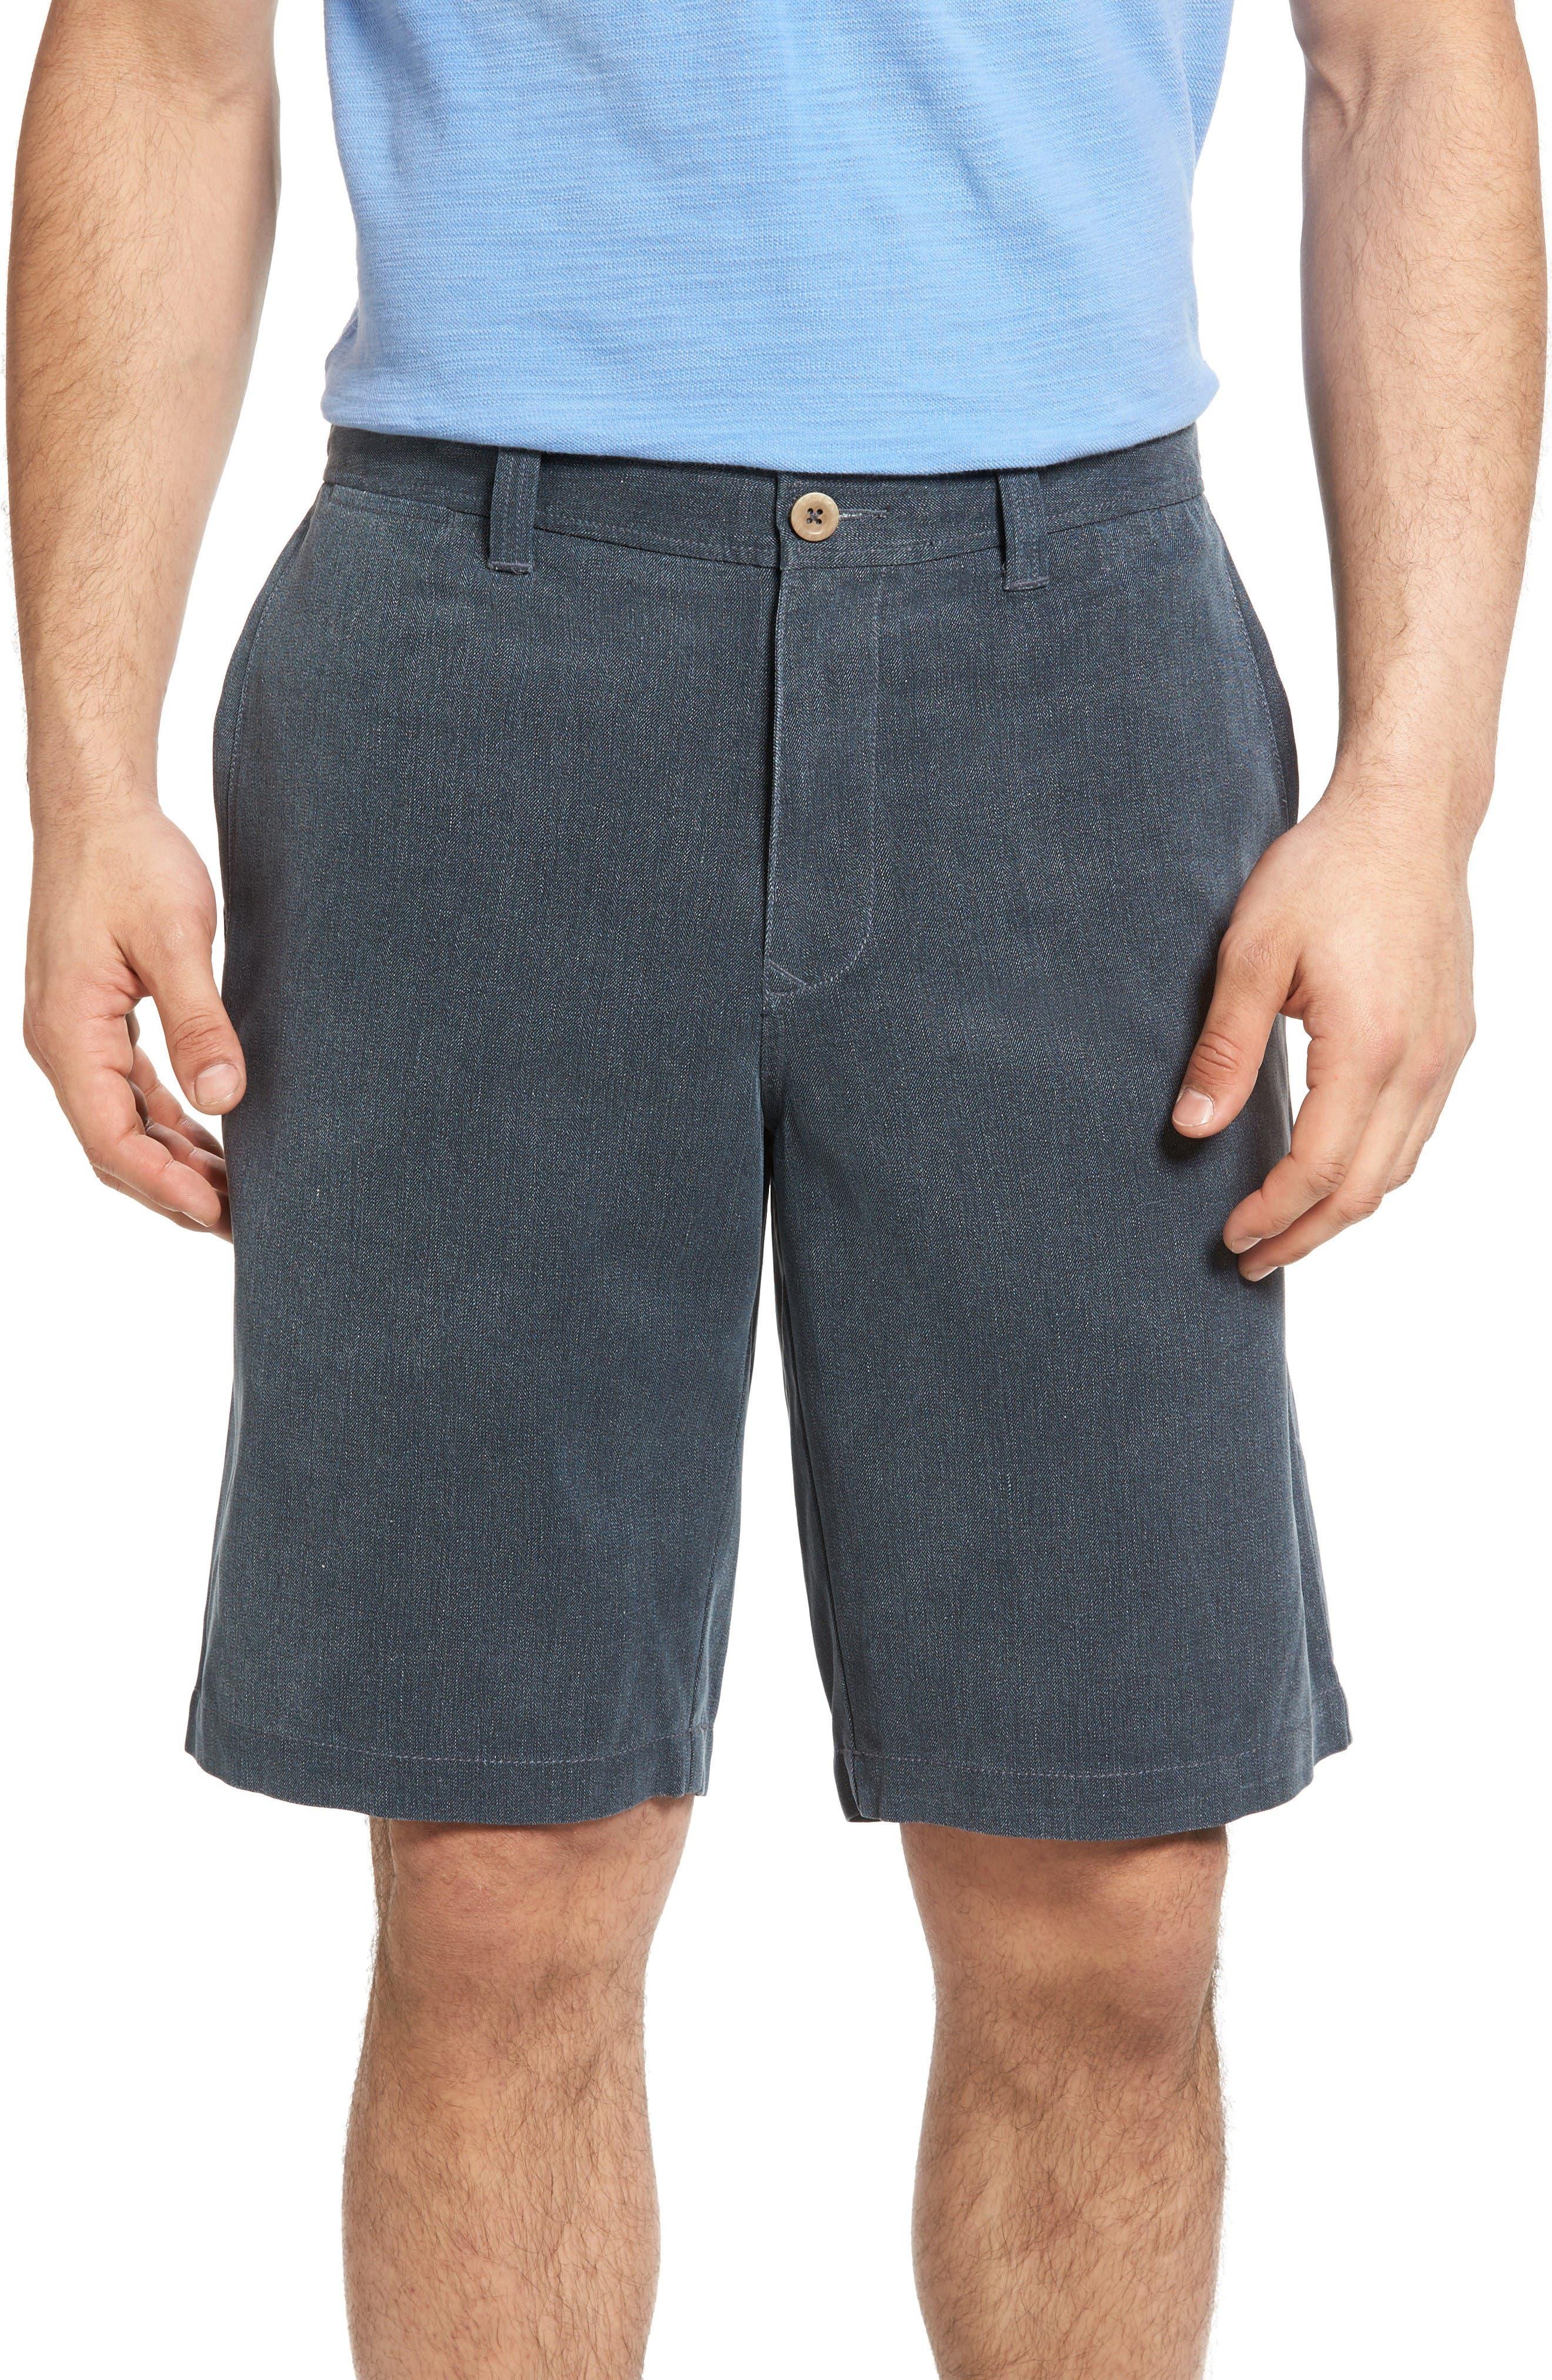 Alternate Image 1 Selected - Tommy Bahama Havana Herringbone Silk Blend Chino Shorts